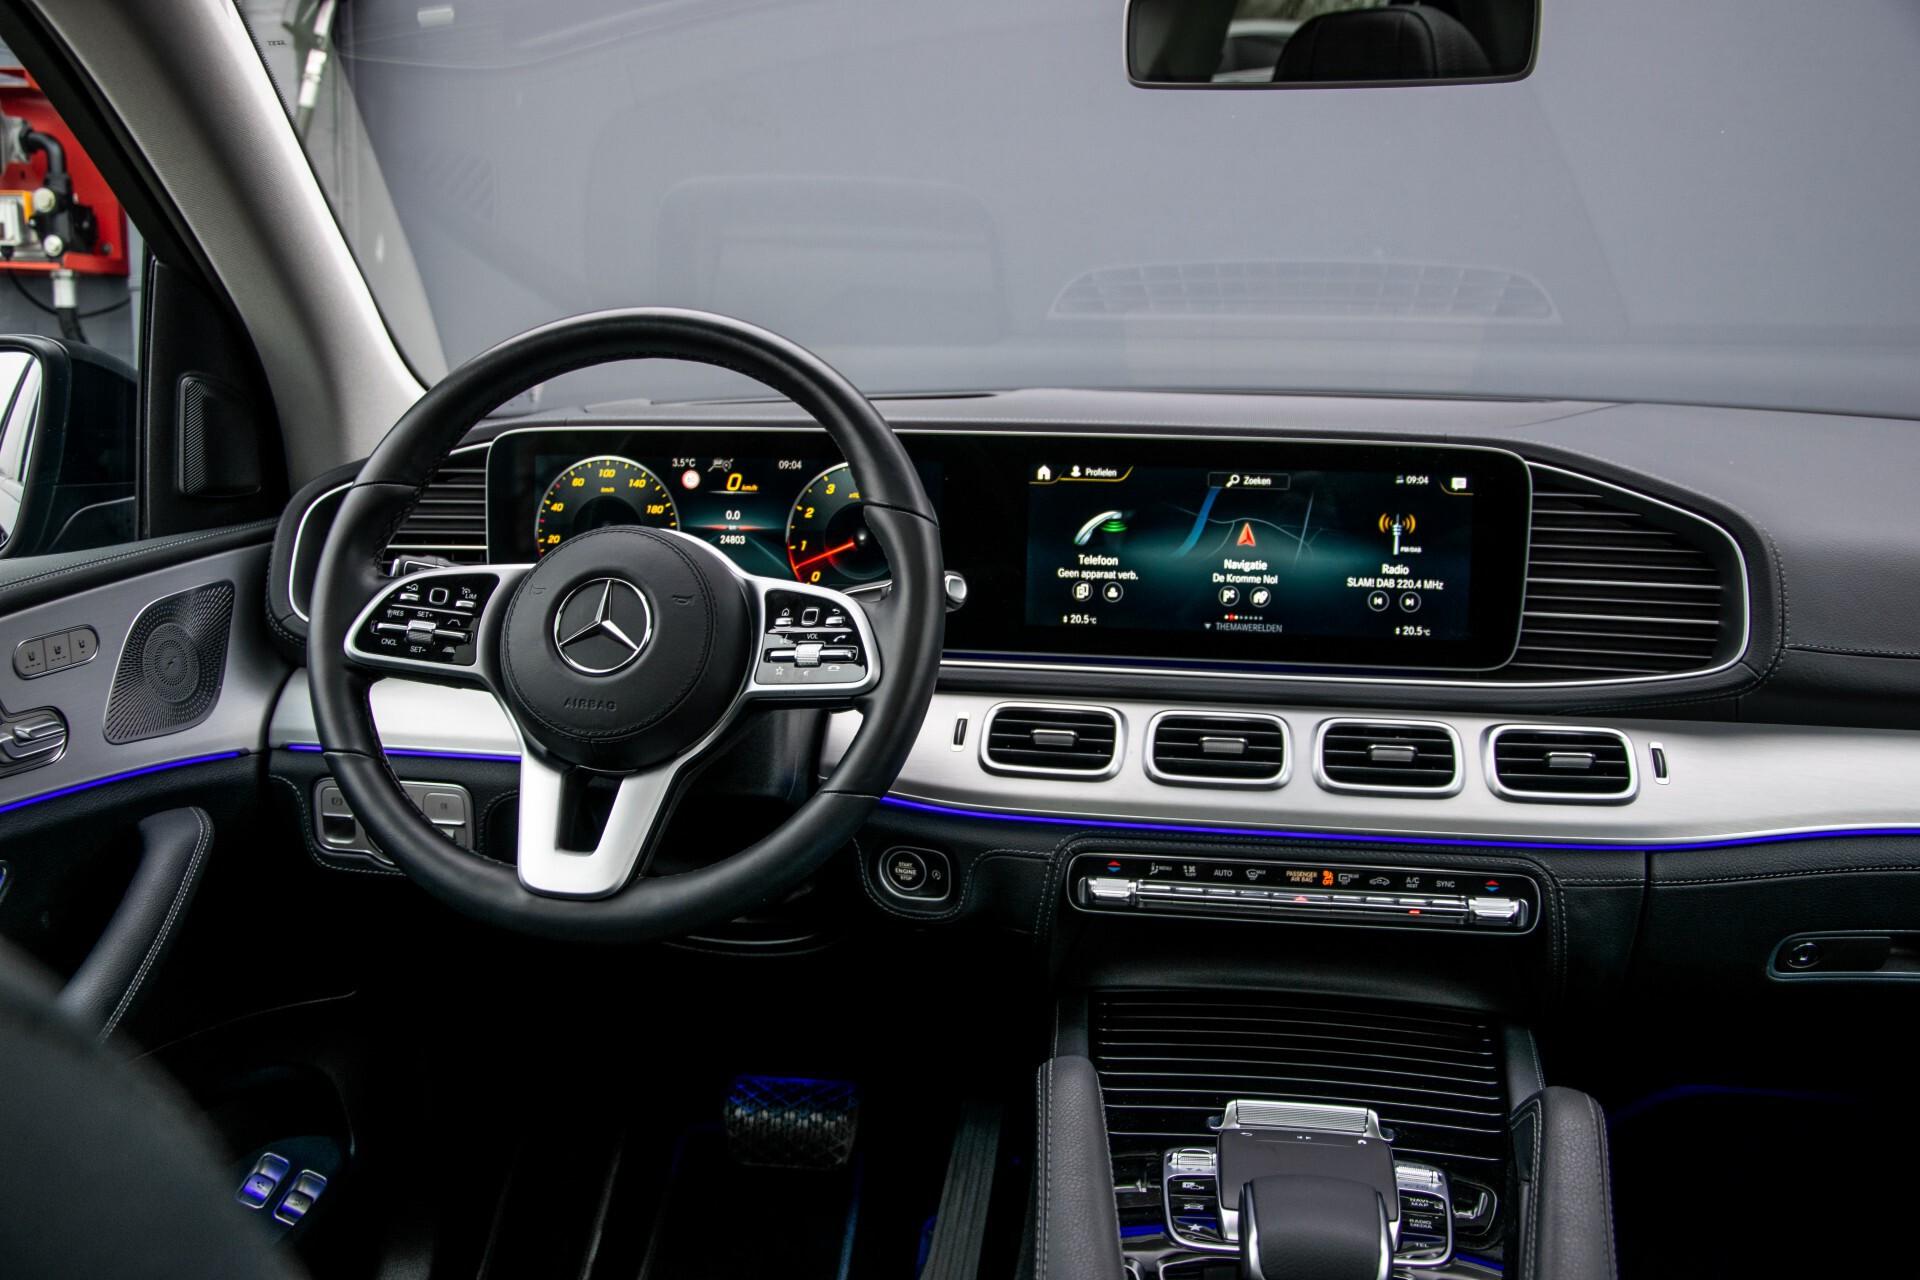 Mercedes-Benz GLE 450 4-M 7-Persoons AMG Massage/Rij-assist/Keyless/TV/360/Night/Trekhaak Aut9 Foto 9